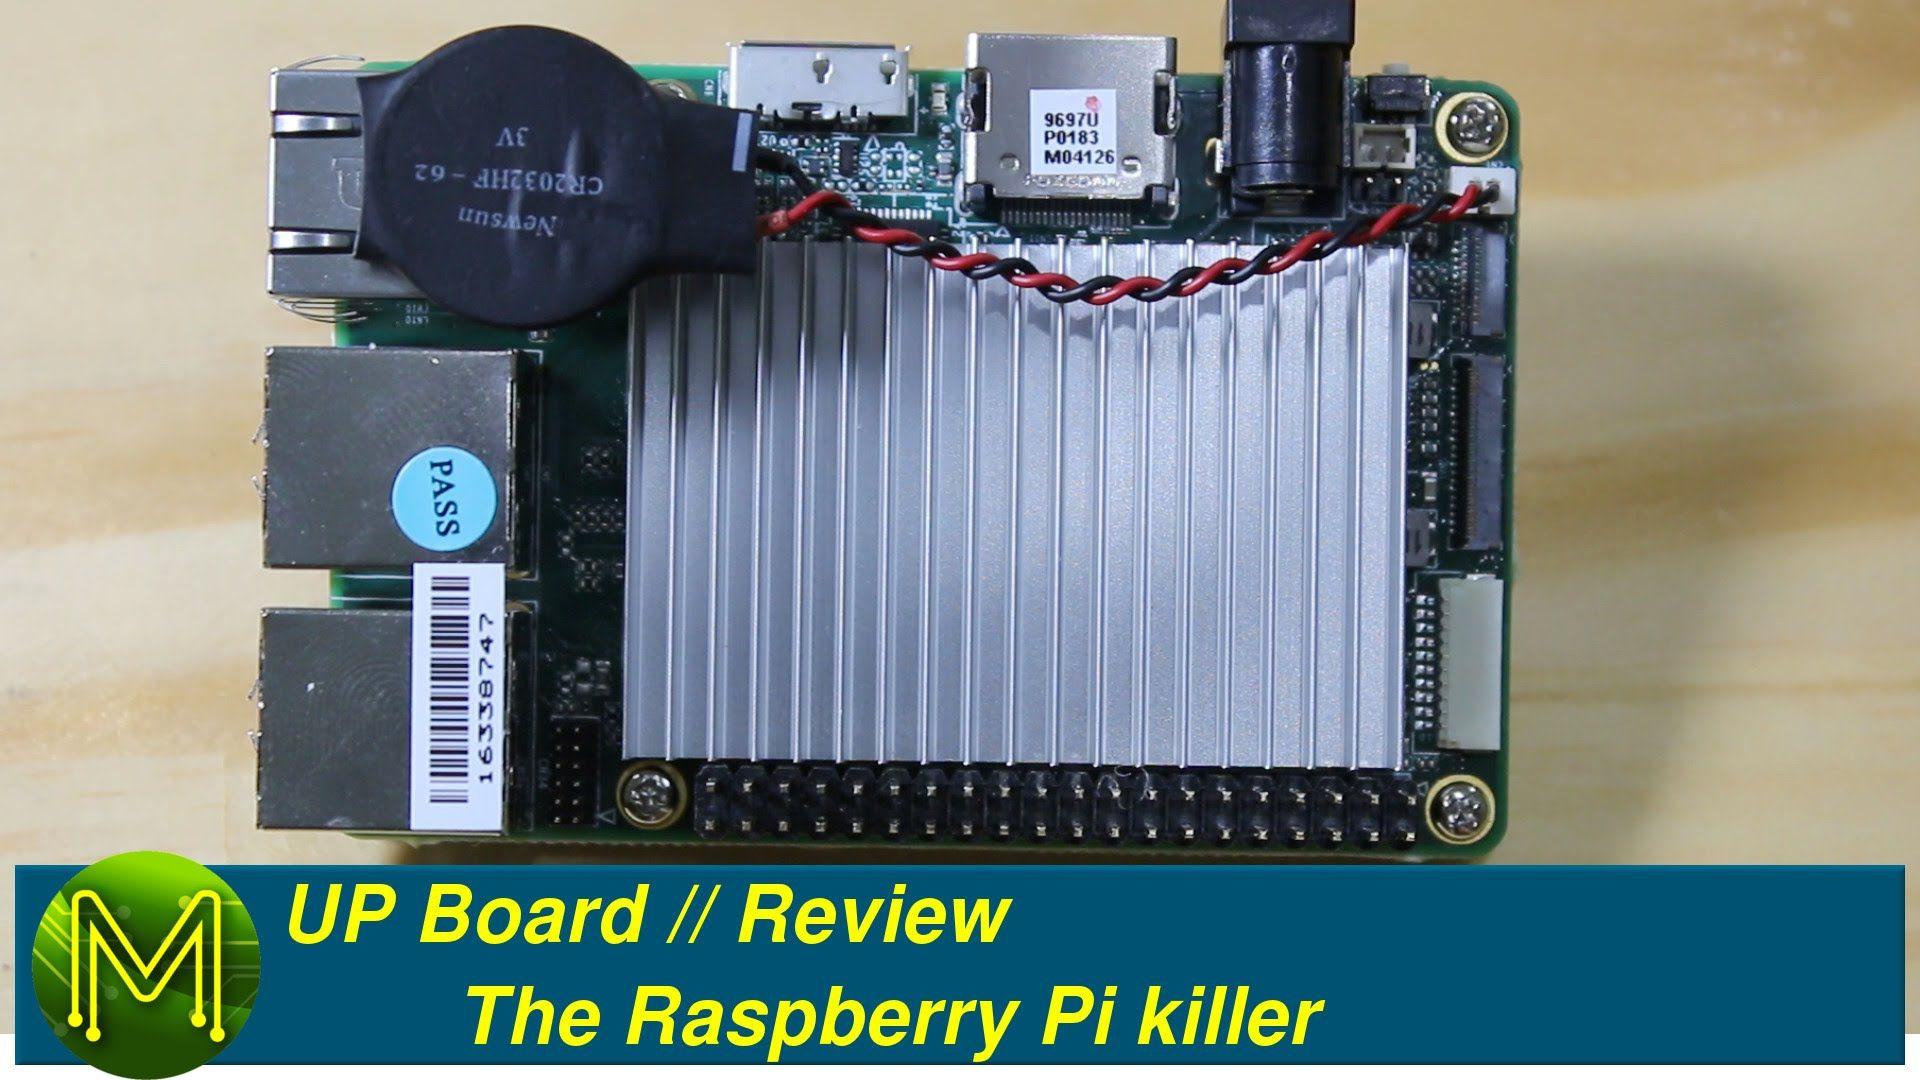 Pin by Aaron Hennick on boardz | Raspberry pi alternatives